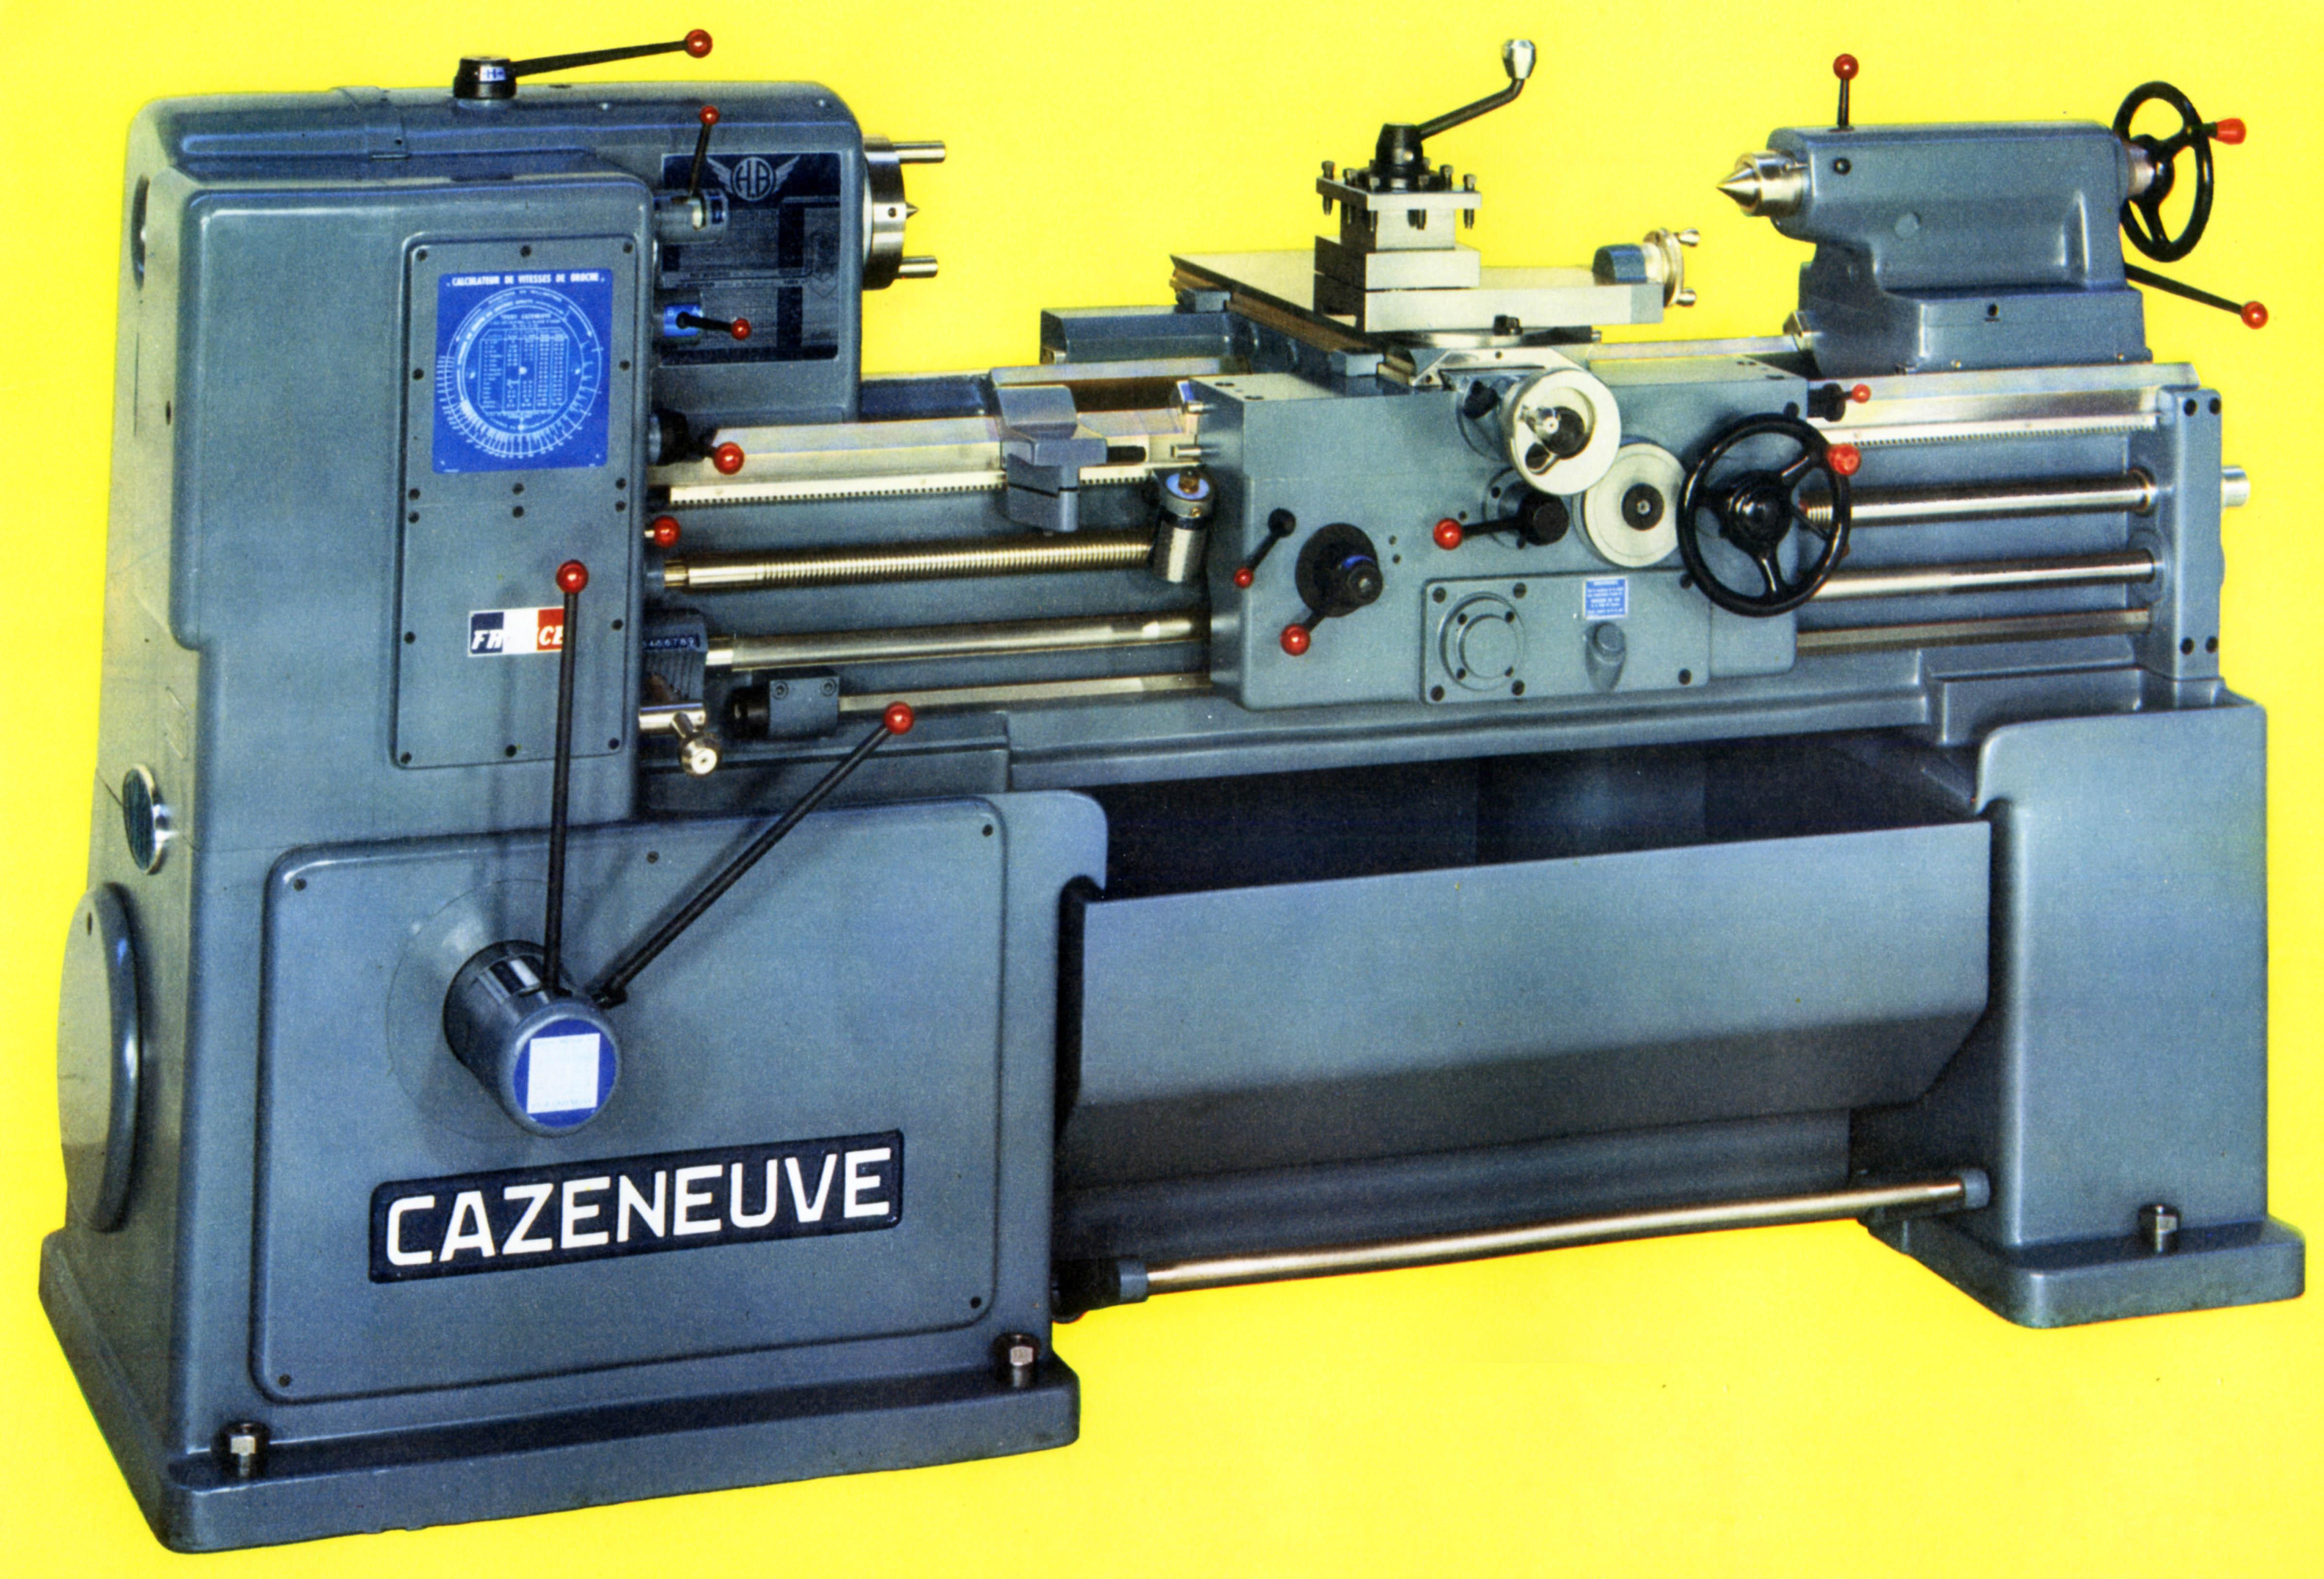 Cazeneuve Lathe Motor Wiring Diagram - House Wiring Diagram Symbols •